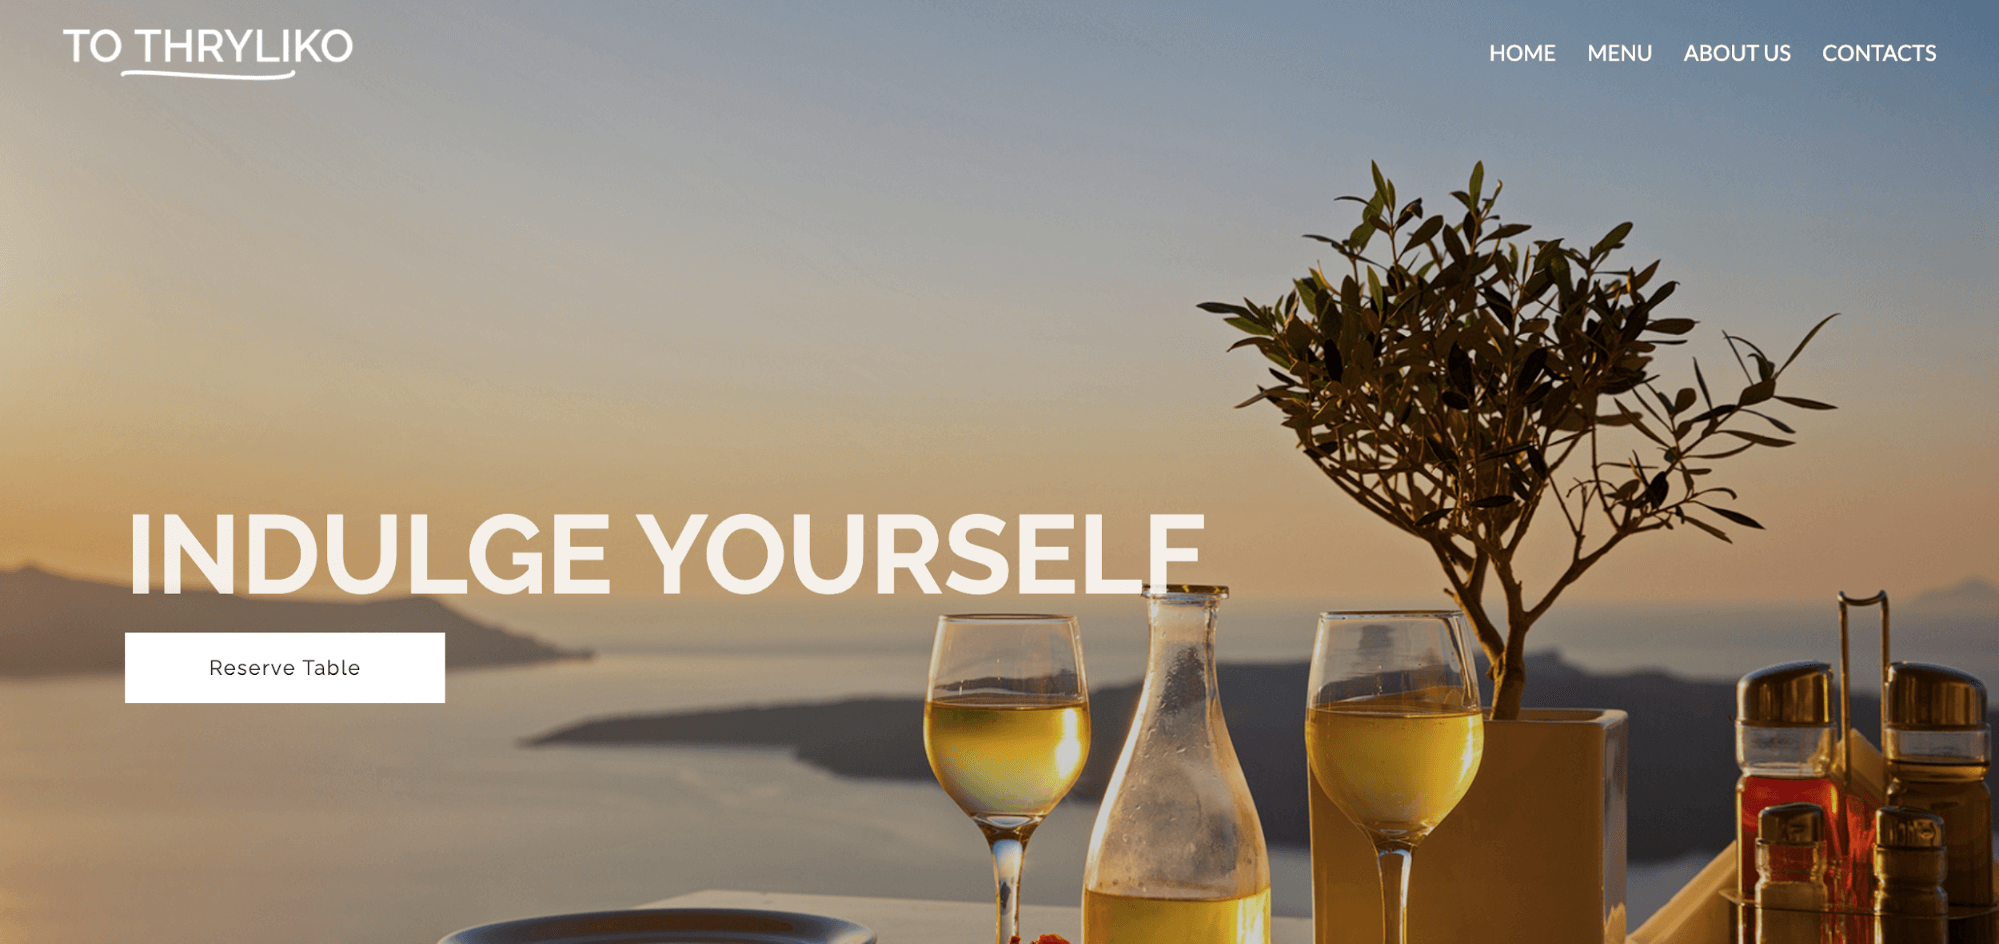 ToThryliko-restaurant website template-ucraft